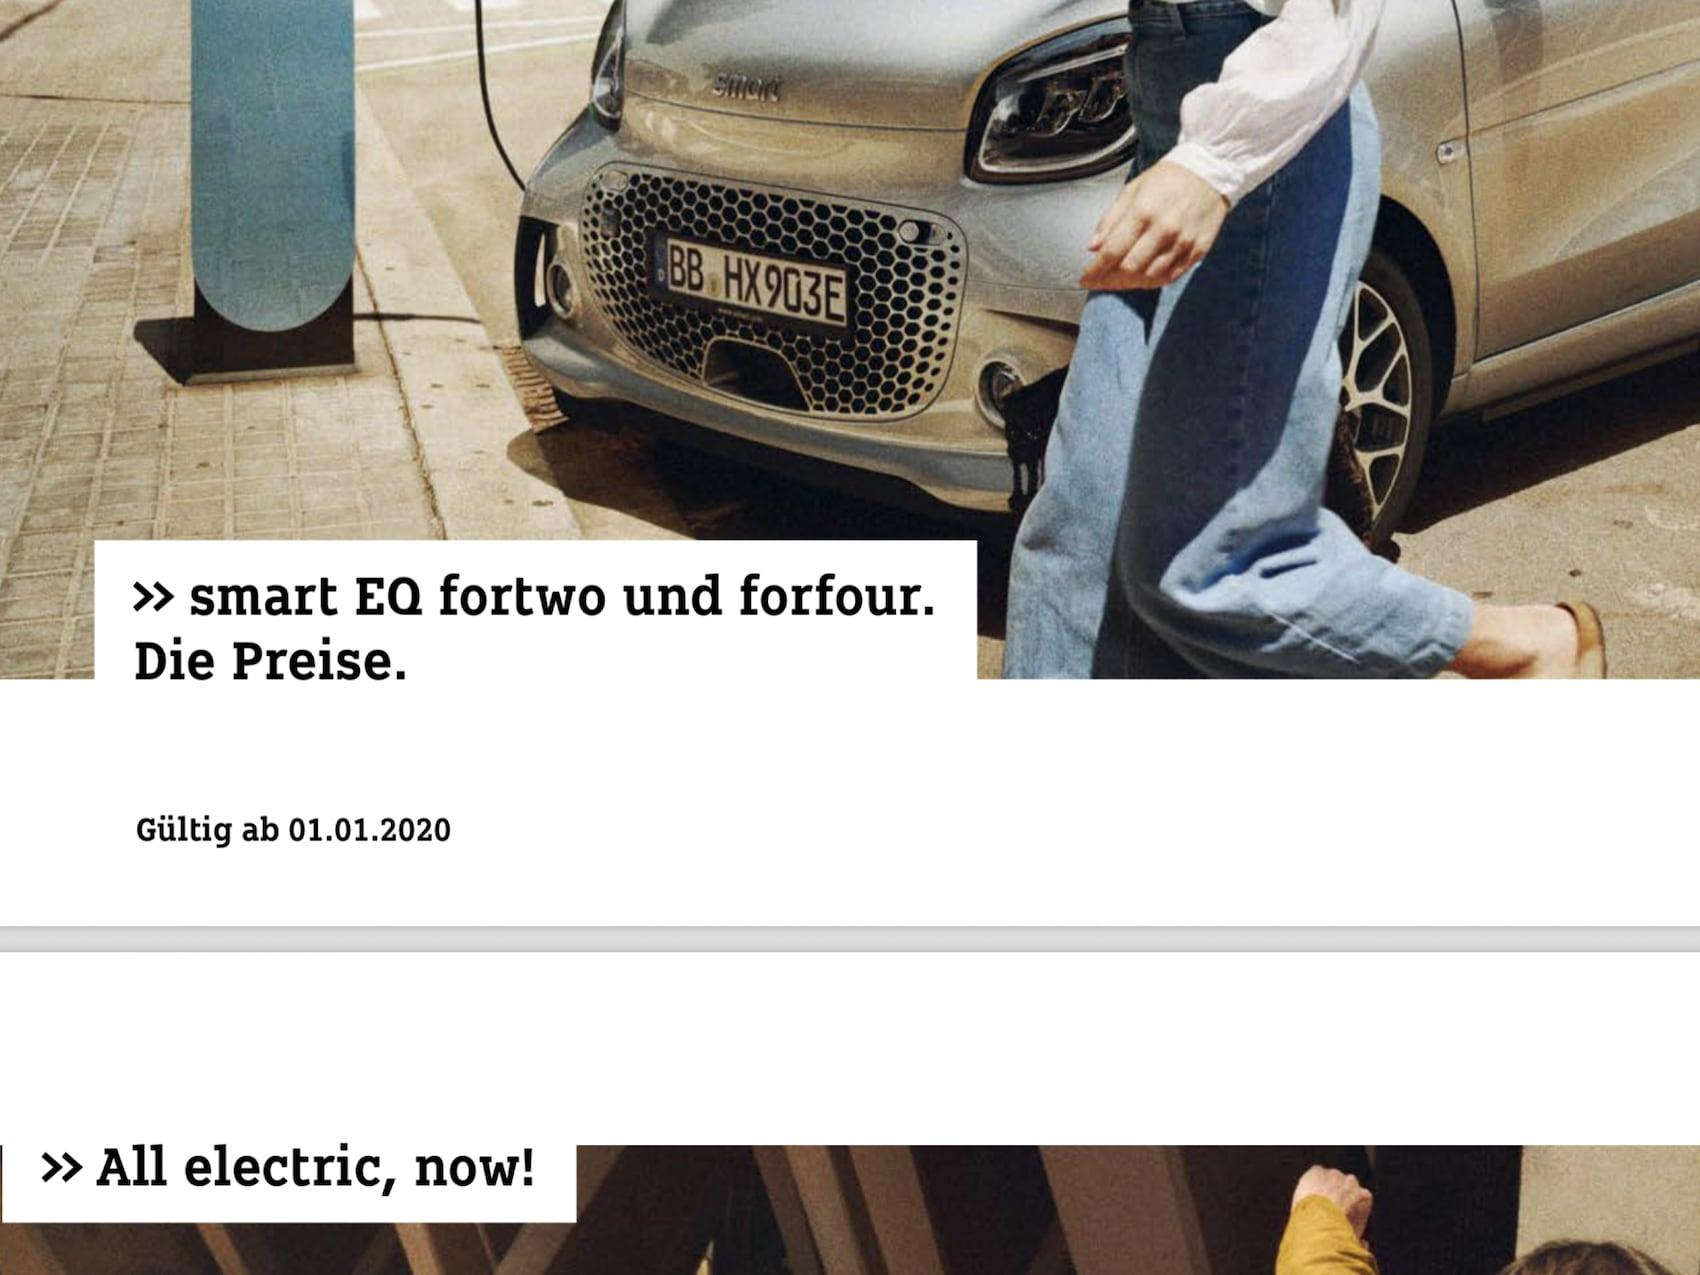 Preisliste: smart EQ fortwo und forfour